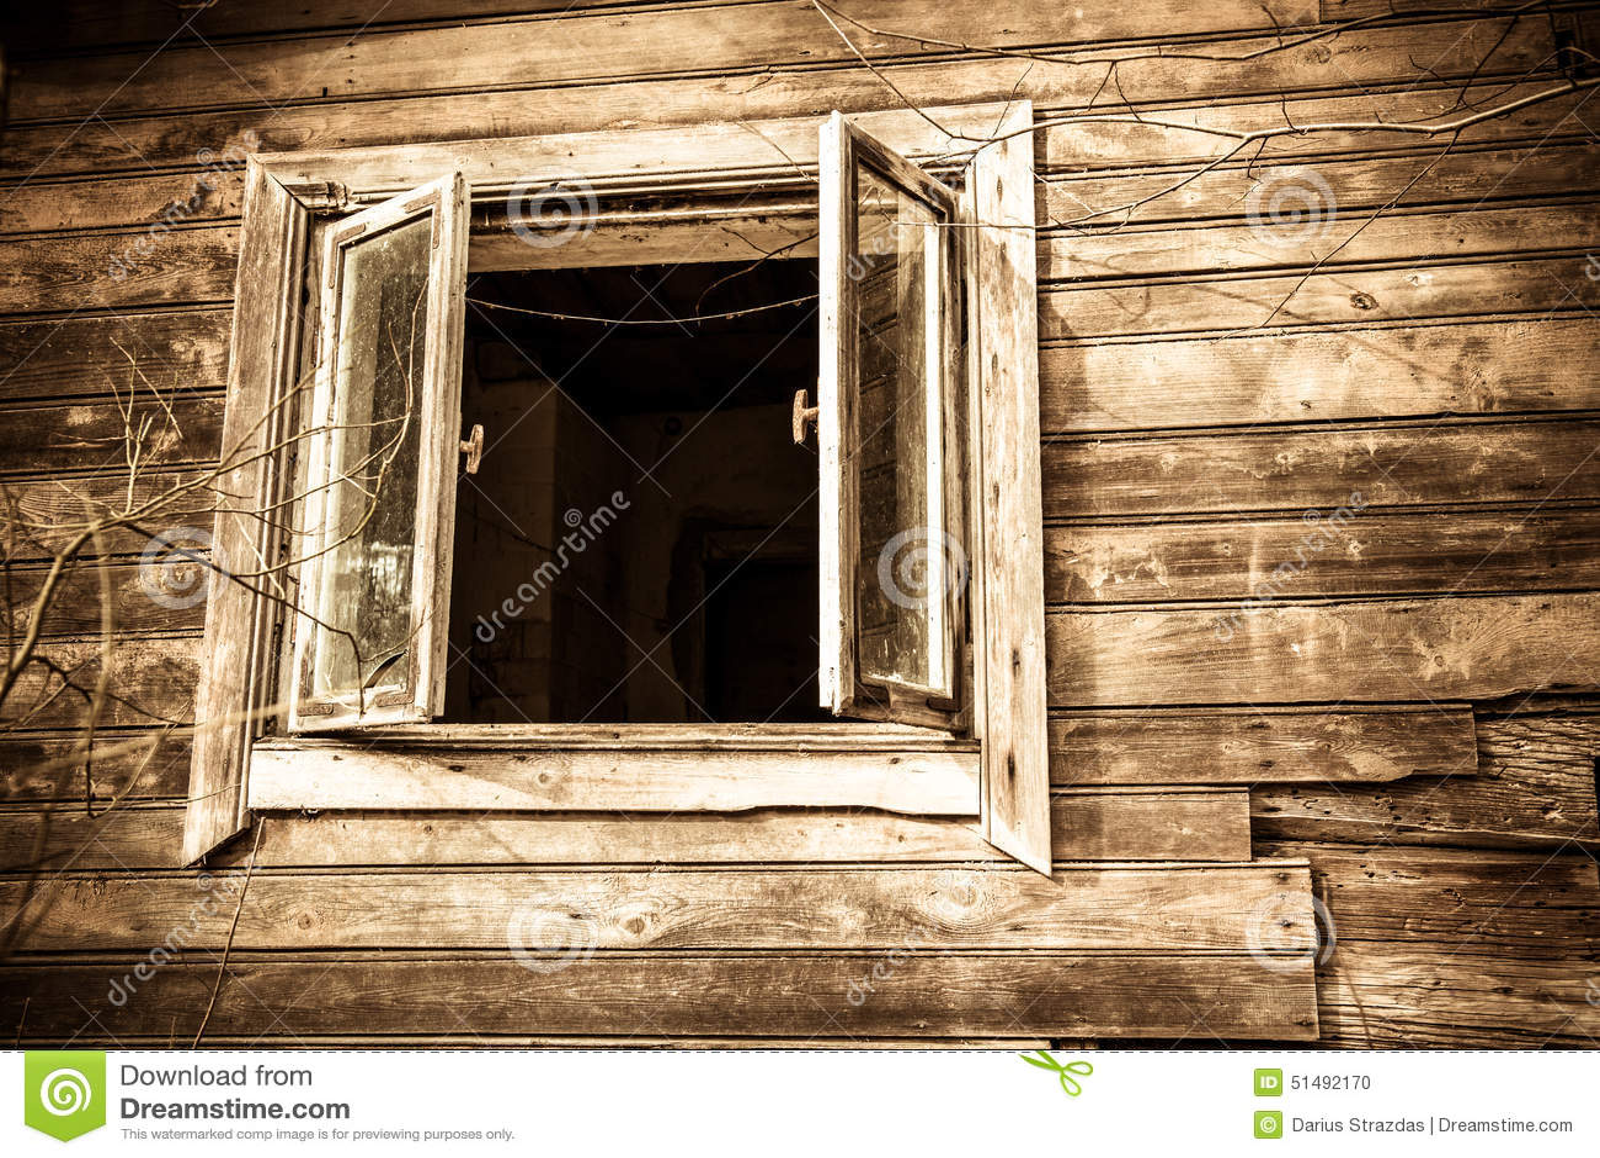 House window images - Old House Window Stock Photo